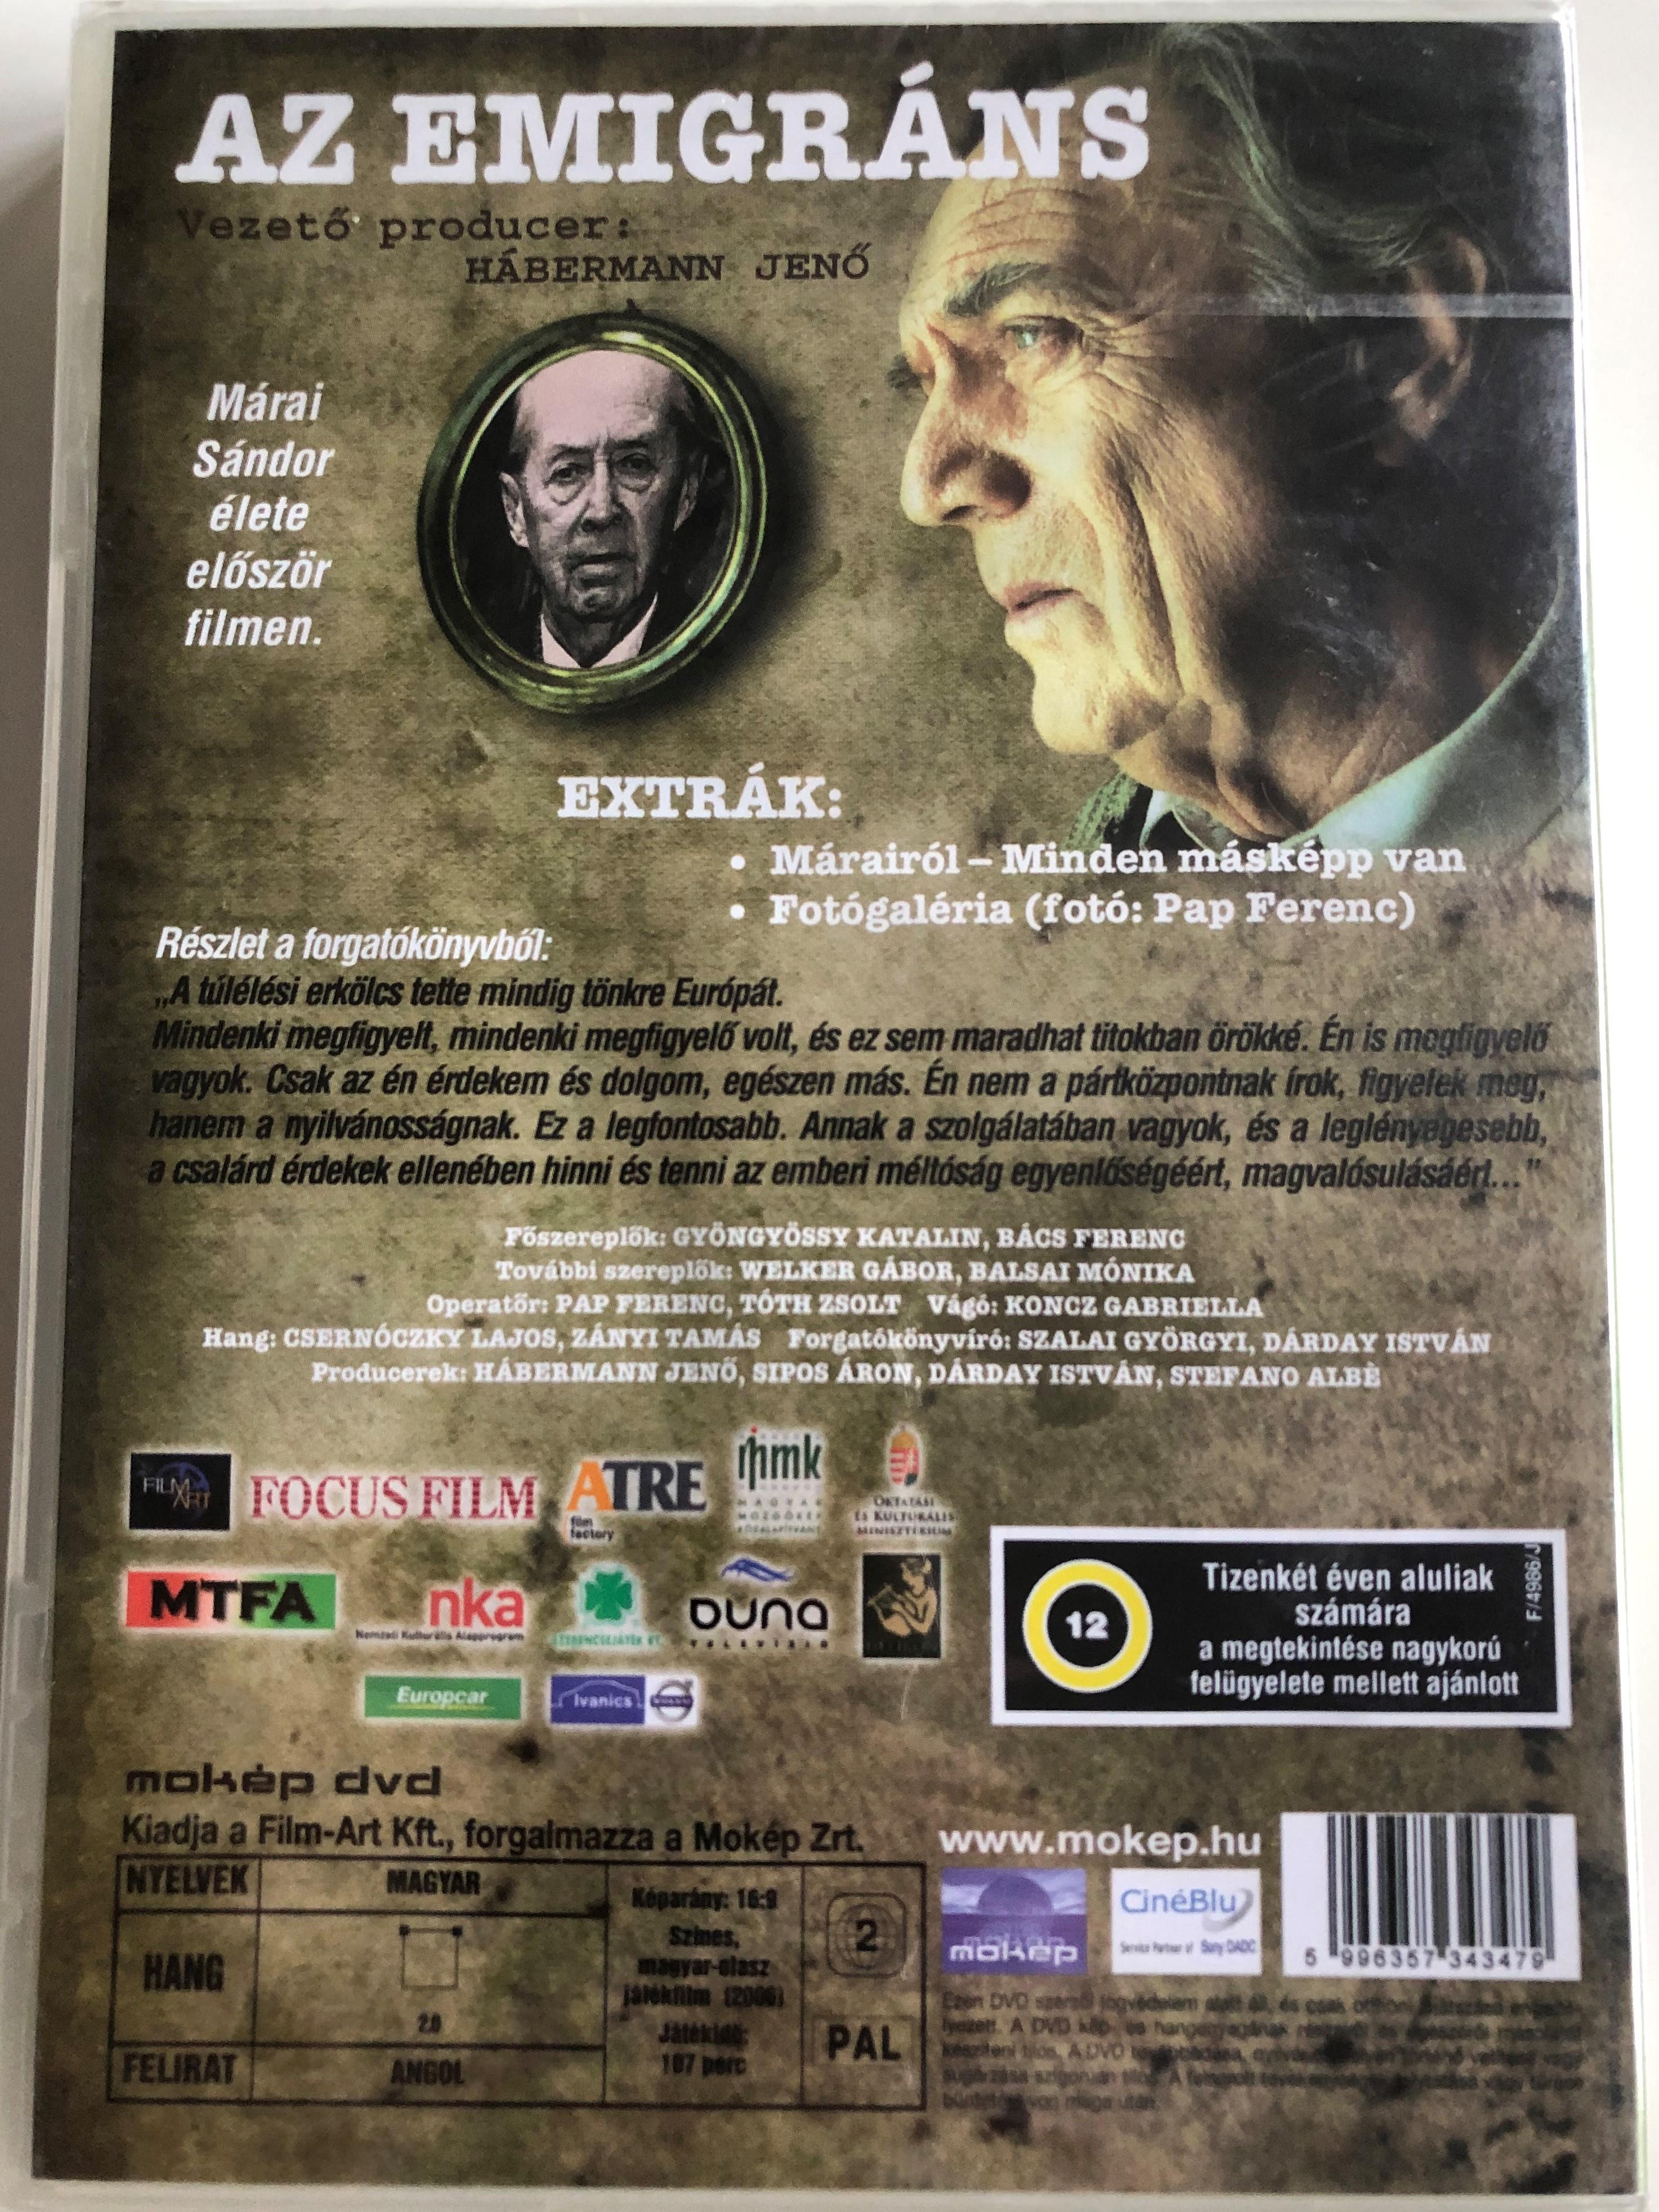 az-emigr-ns-dvd-2007-the-immigrant-directed-by-szalai-gy-rgyi-d-rday-istv-n-2.jpg